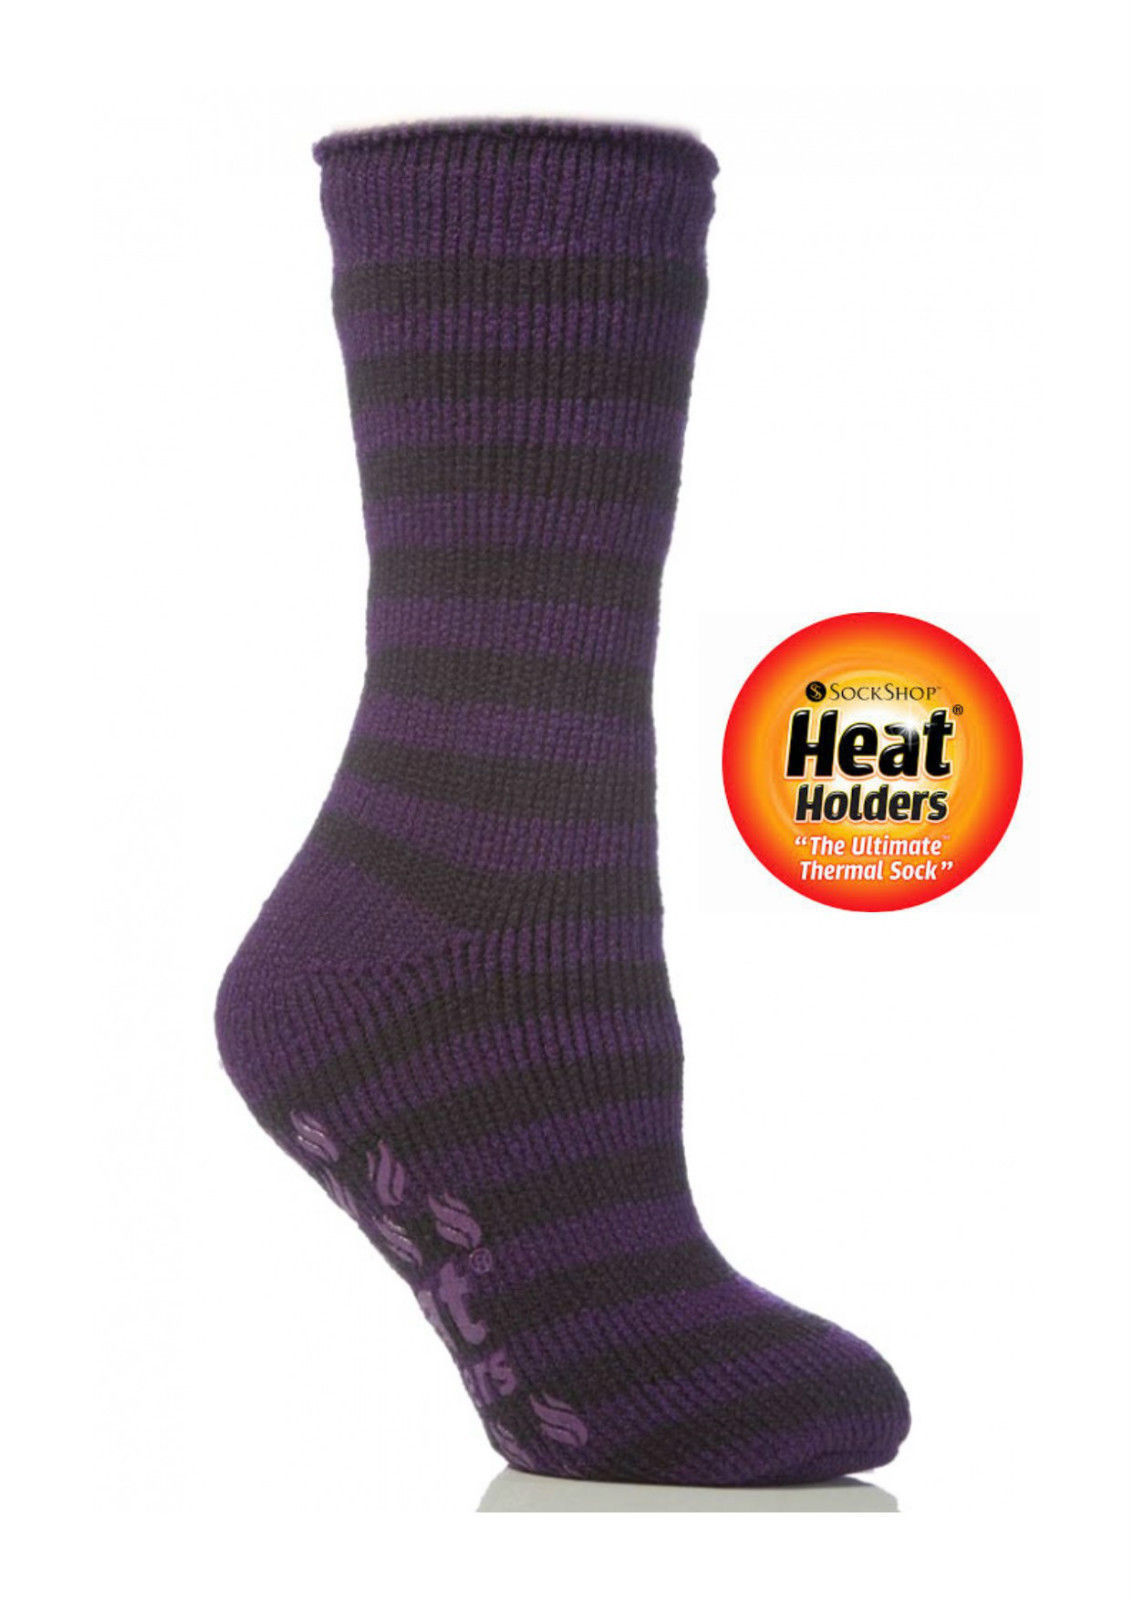 Ladies Striped Heat Holder Slipper Socks Purple Grey 4-8 uk,37-42 eu, 5-9 US